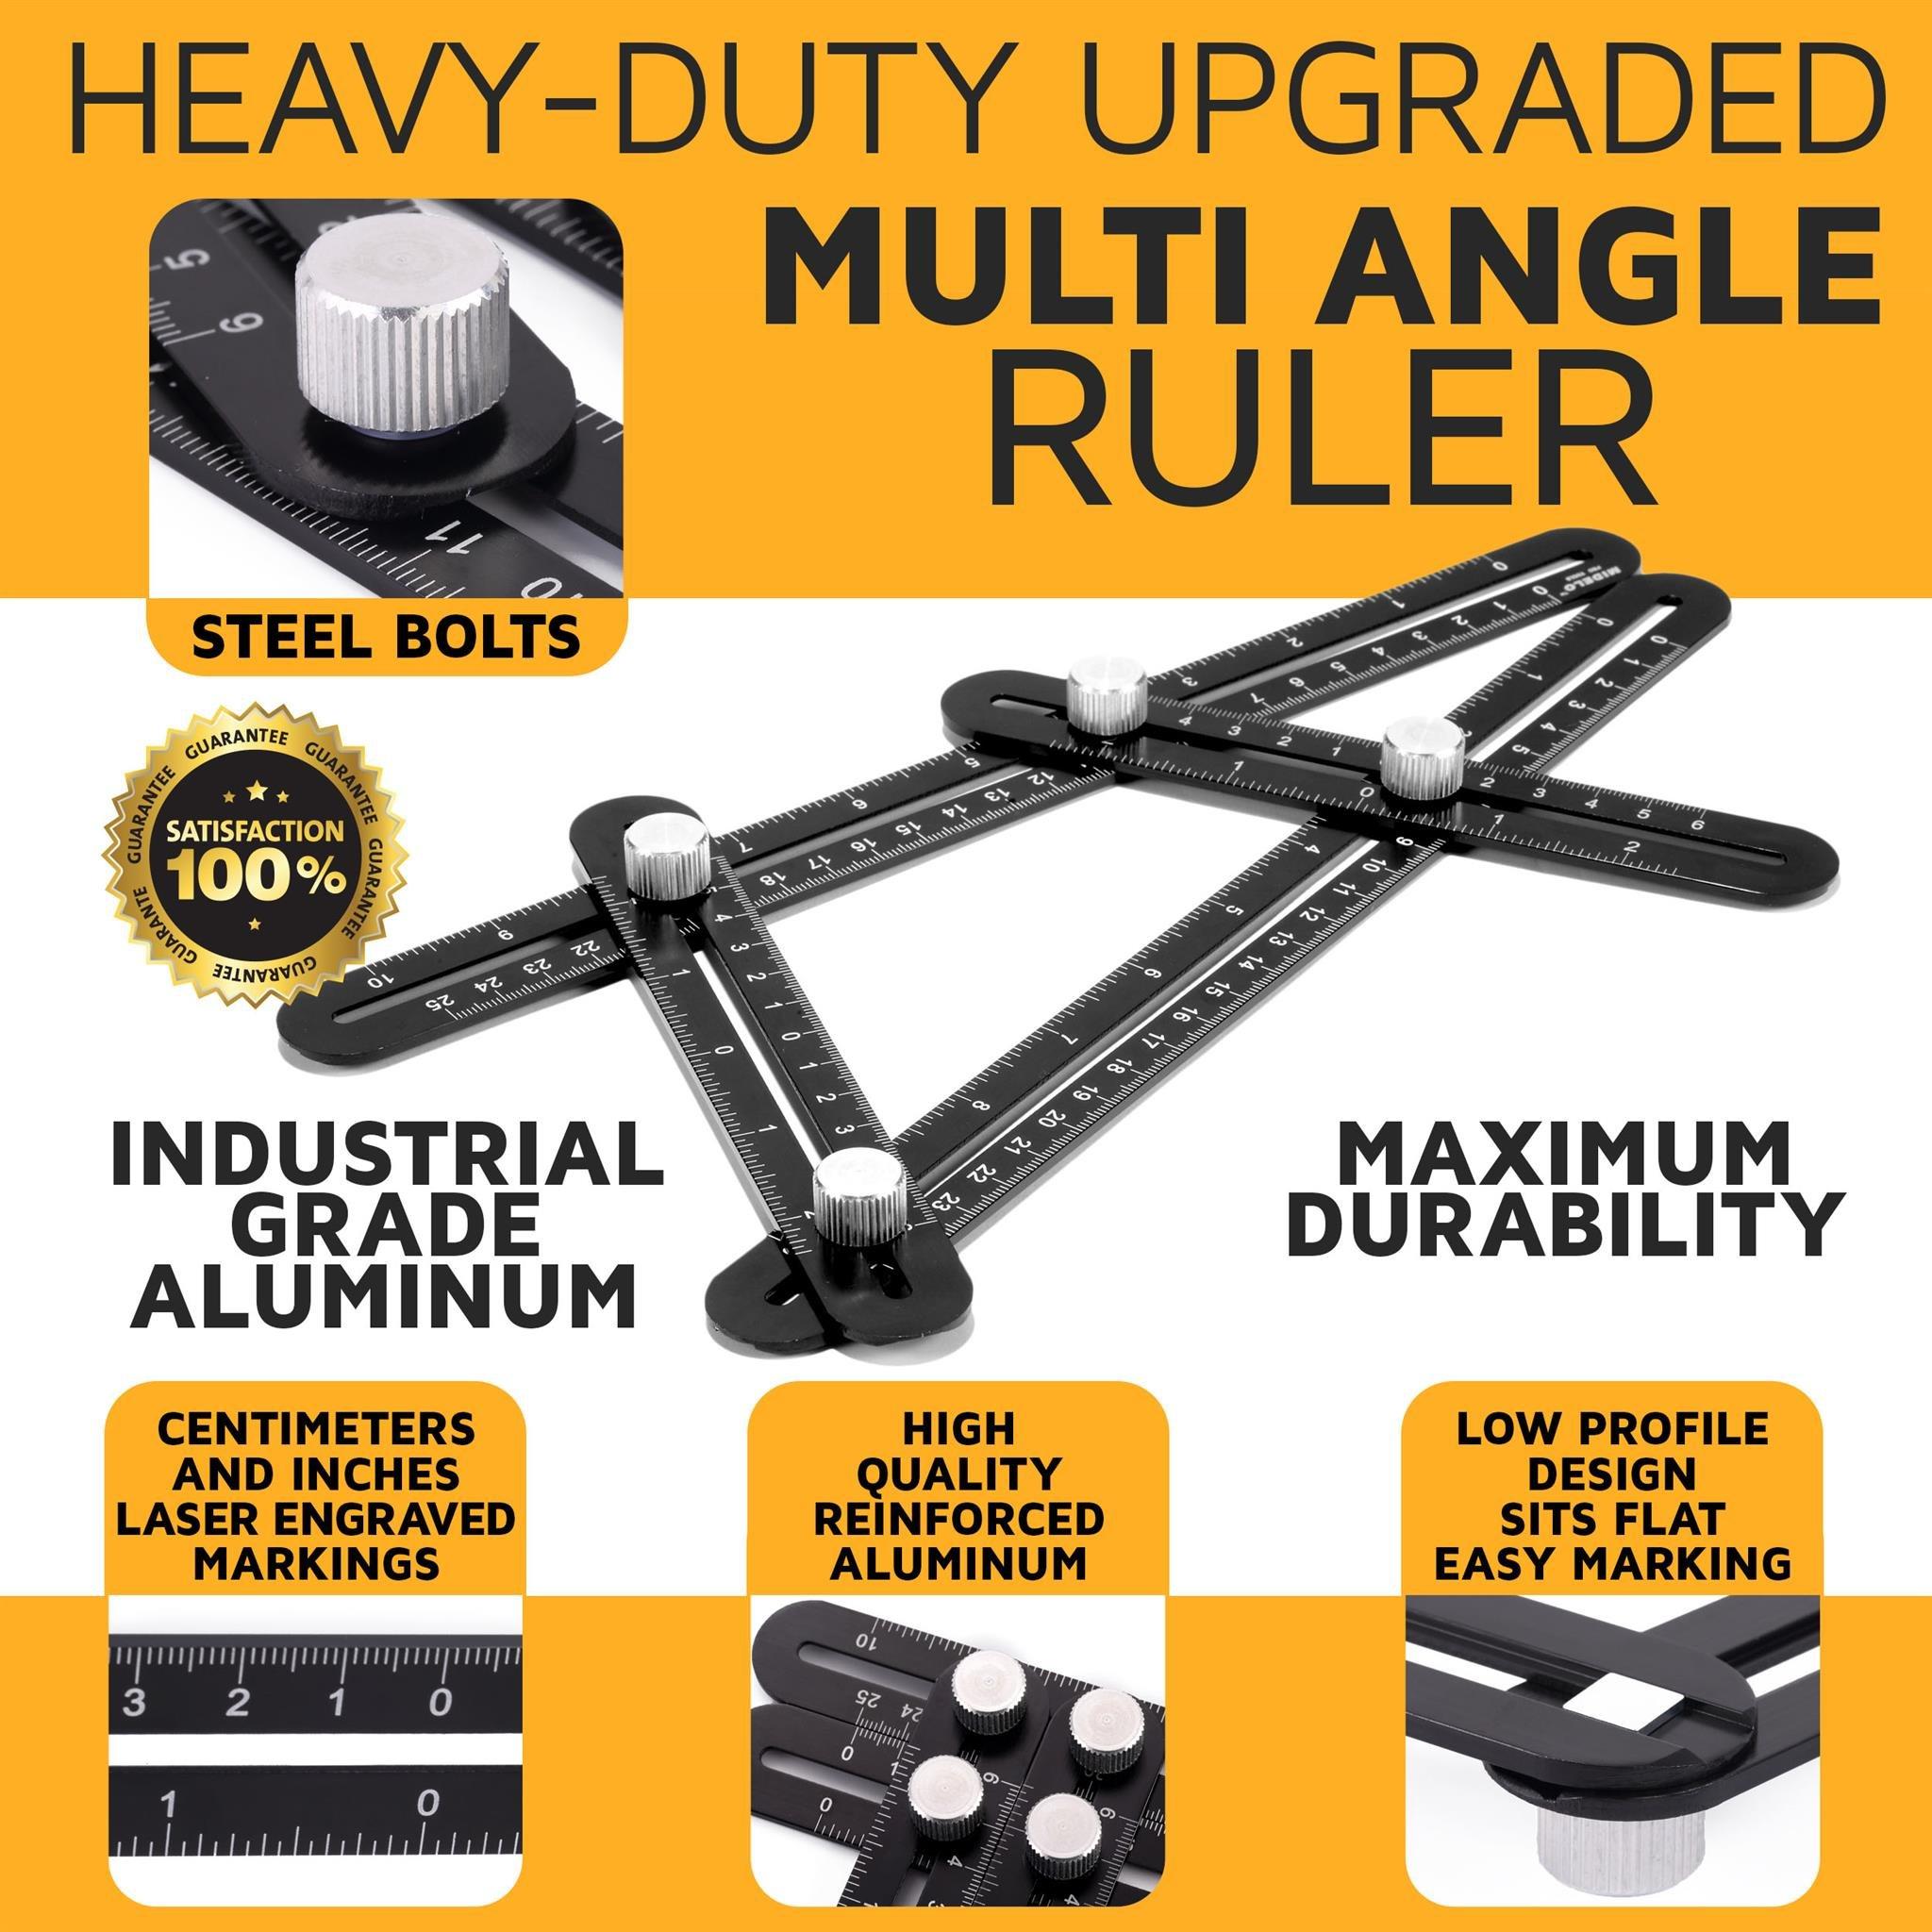 AngleBuddy by Midelo | Aluminum Metal Angleizer Template Tool | Multi Angle Measuring Ruler Angularizer | Ultimate Irregular Shape Layout Copy Anglulizer | BONUS 6-in-1 Multi Tool & Bubble Level by Midelo (Image #2)